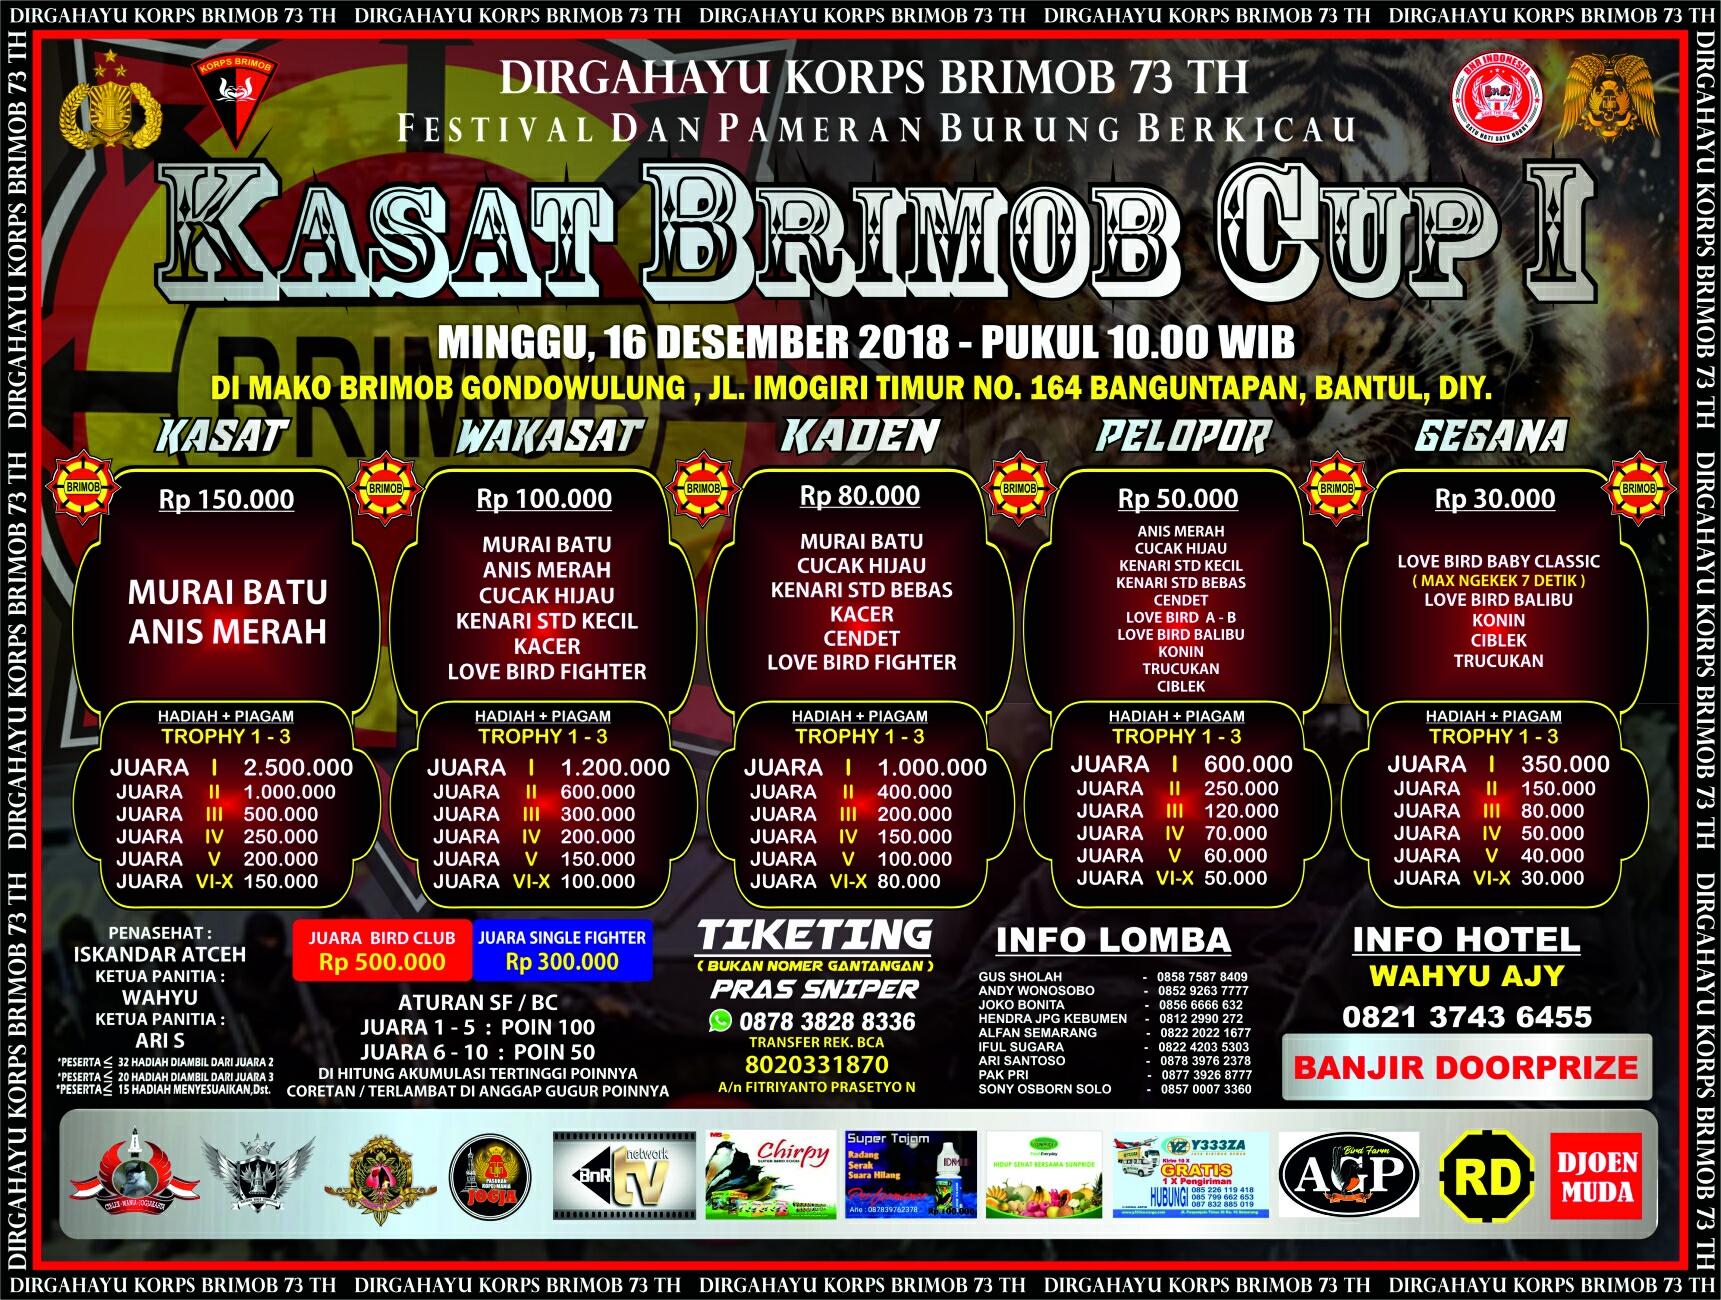 Daftar Juara Bandung Lautan Api Cup 1 Lap A Mediabnr Rkb Tegal Madu Mongso